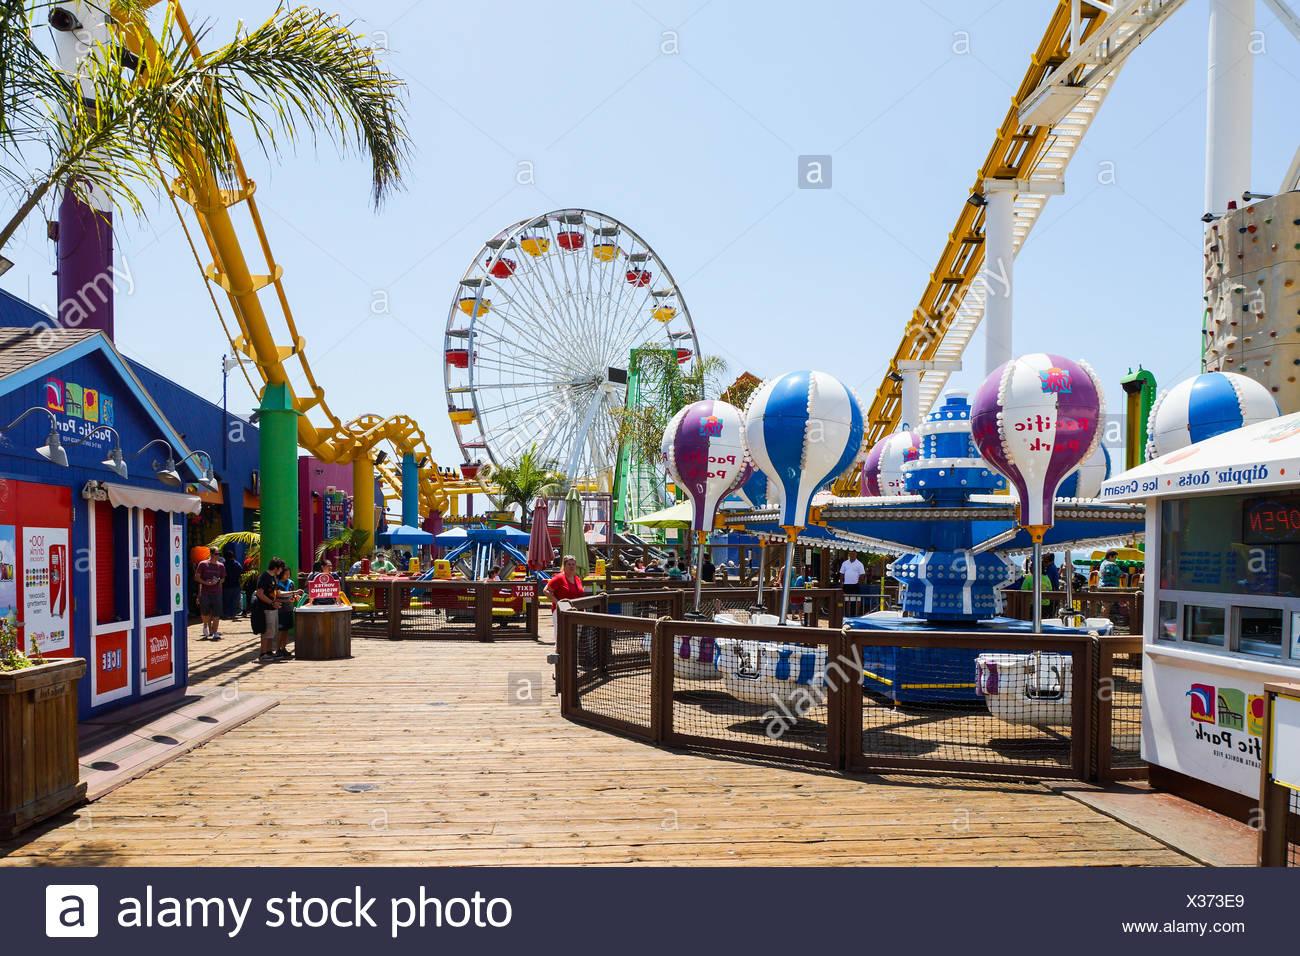 Fun at Santa Monica Pier - Stock Image